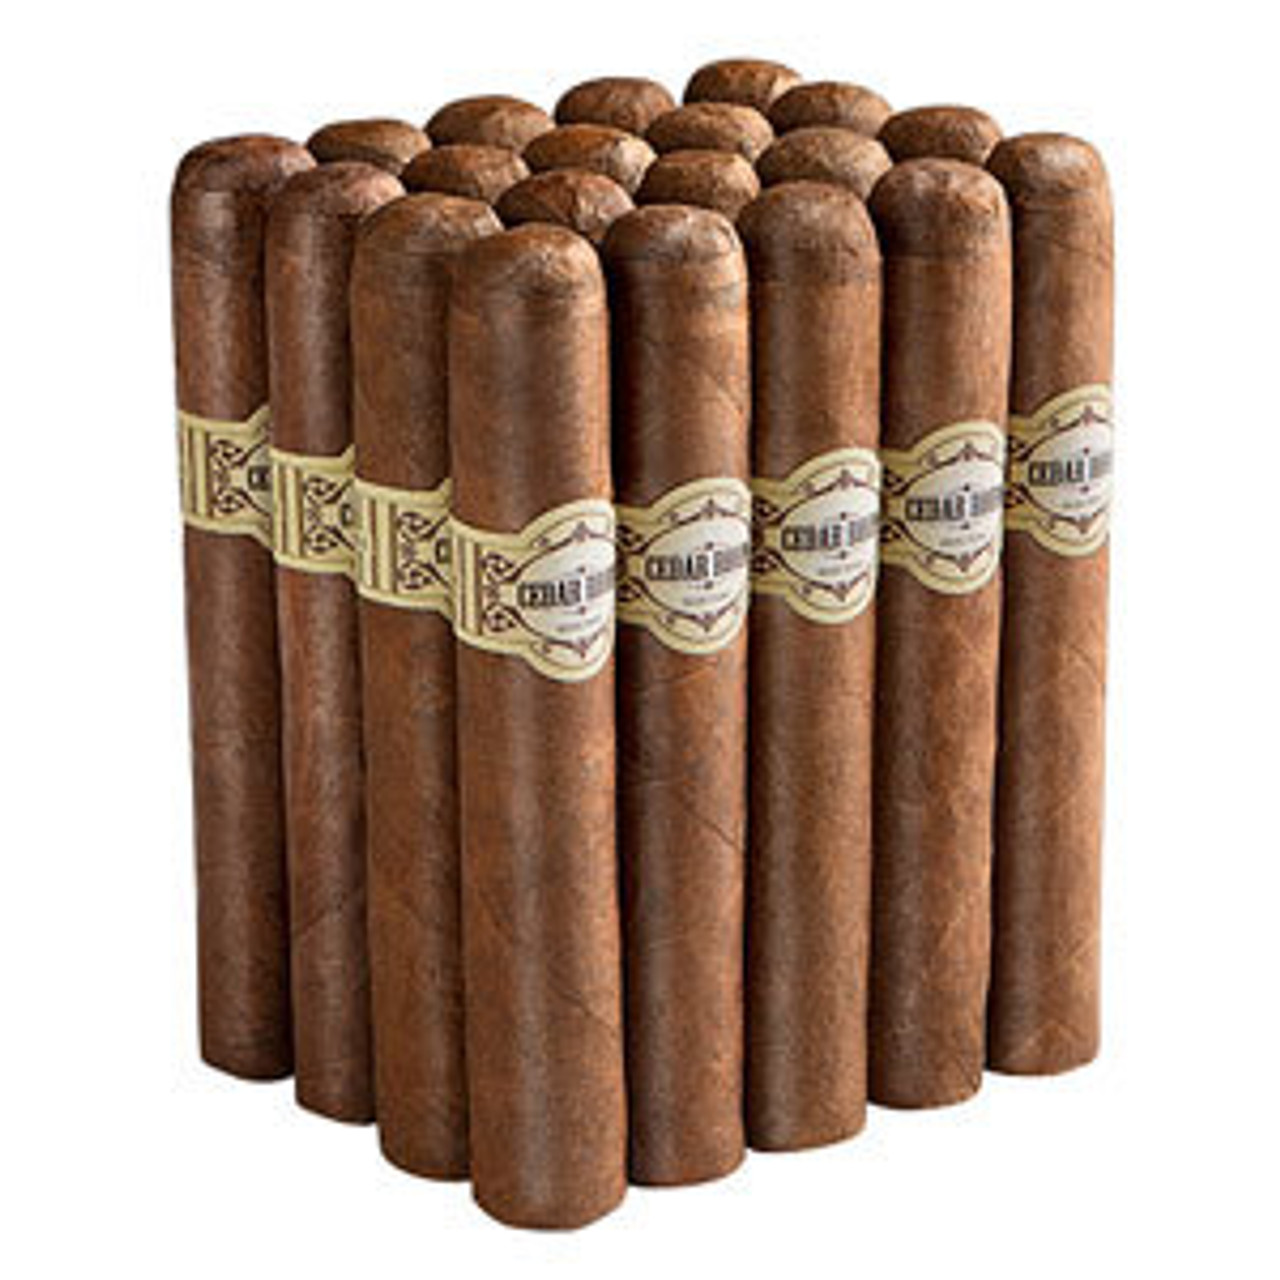 Cedar Room Connecticut Broadleaf Short Robusto Cigars - 4.25 x 54 (Bundle of 20)